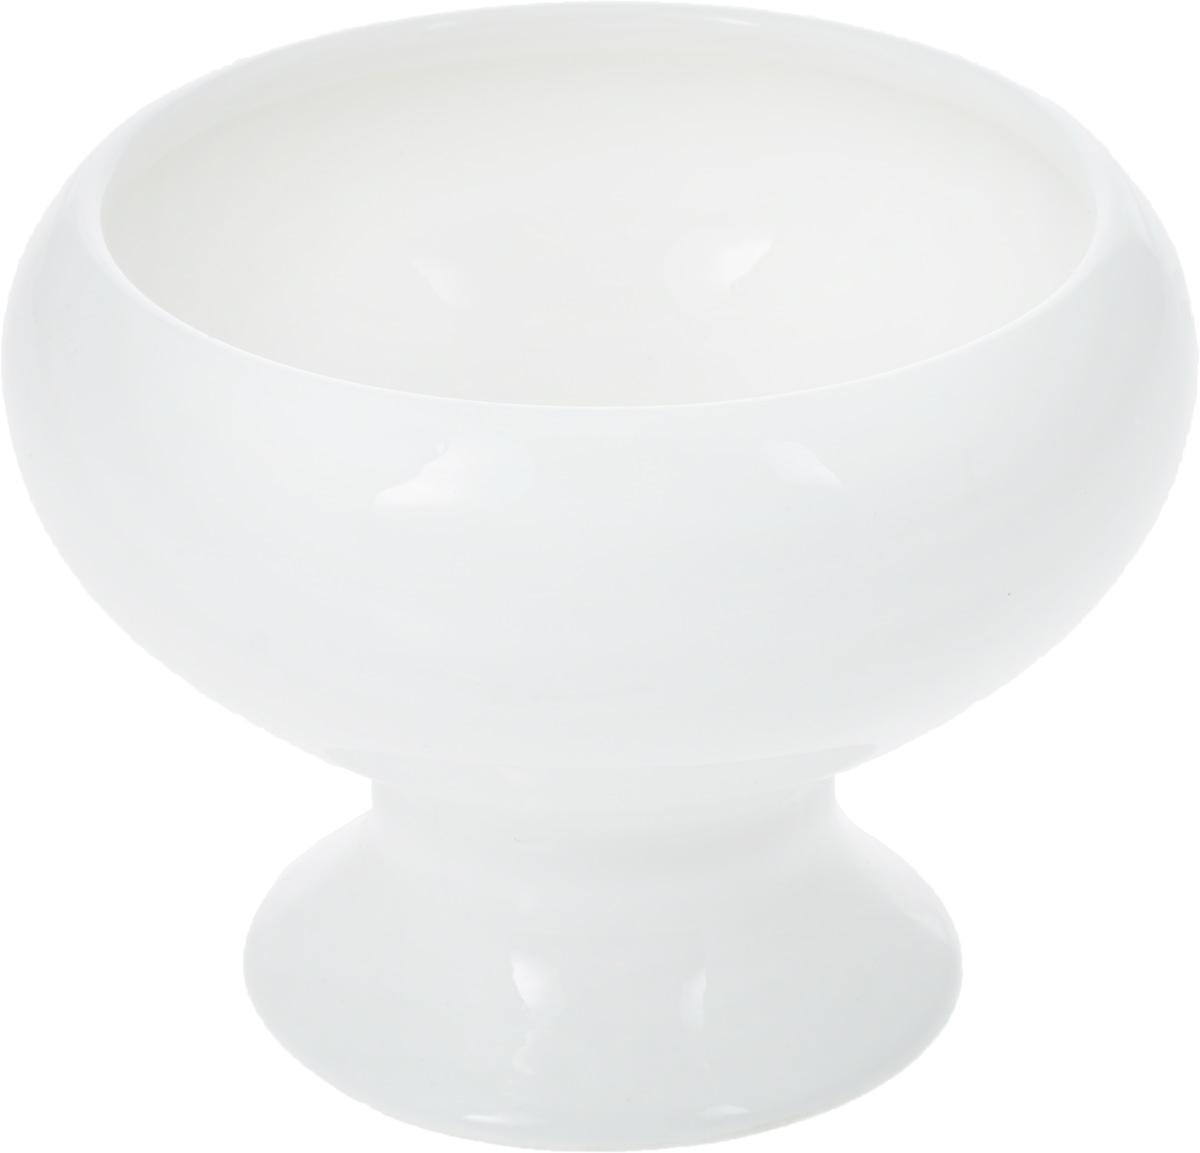 Креманка Wilmax, 285 мл креманка для десертов 100г ложка 13 см 1168246